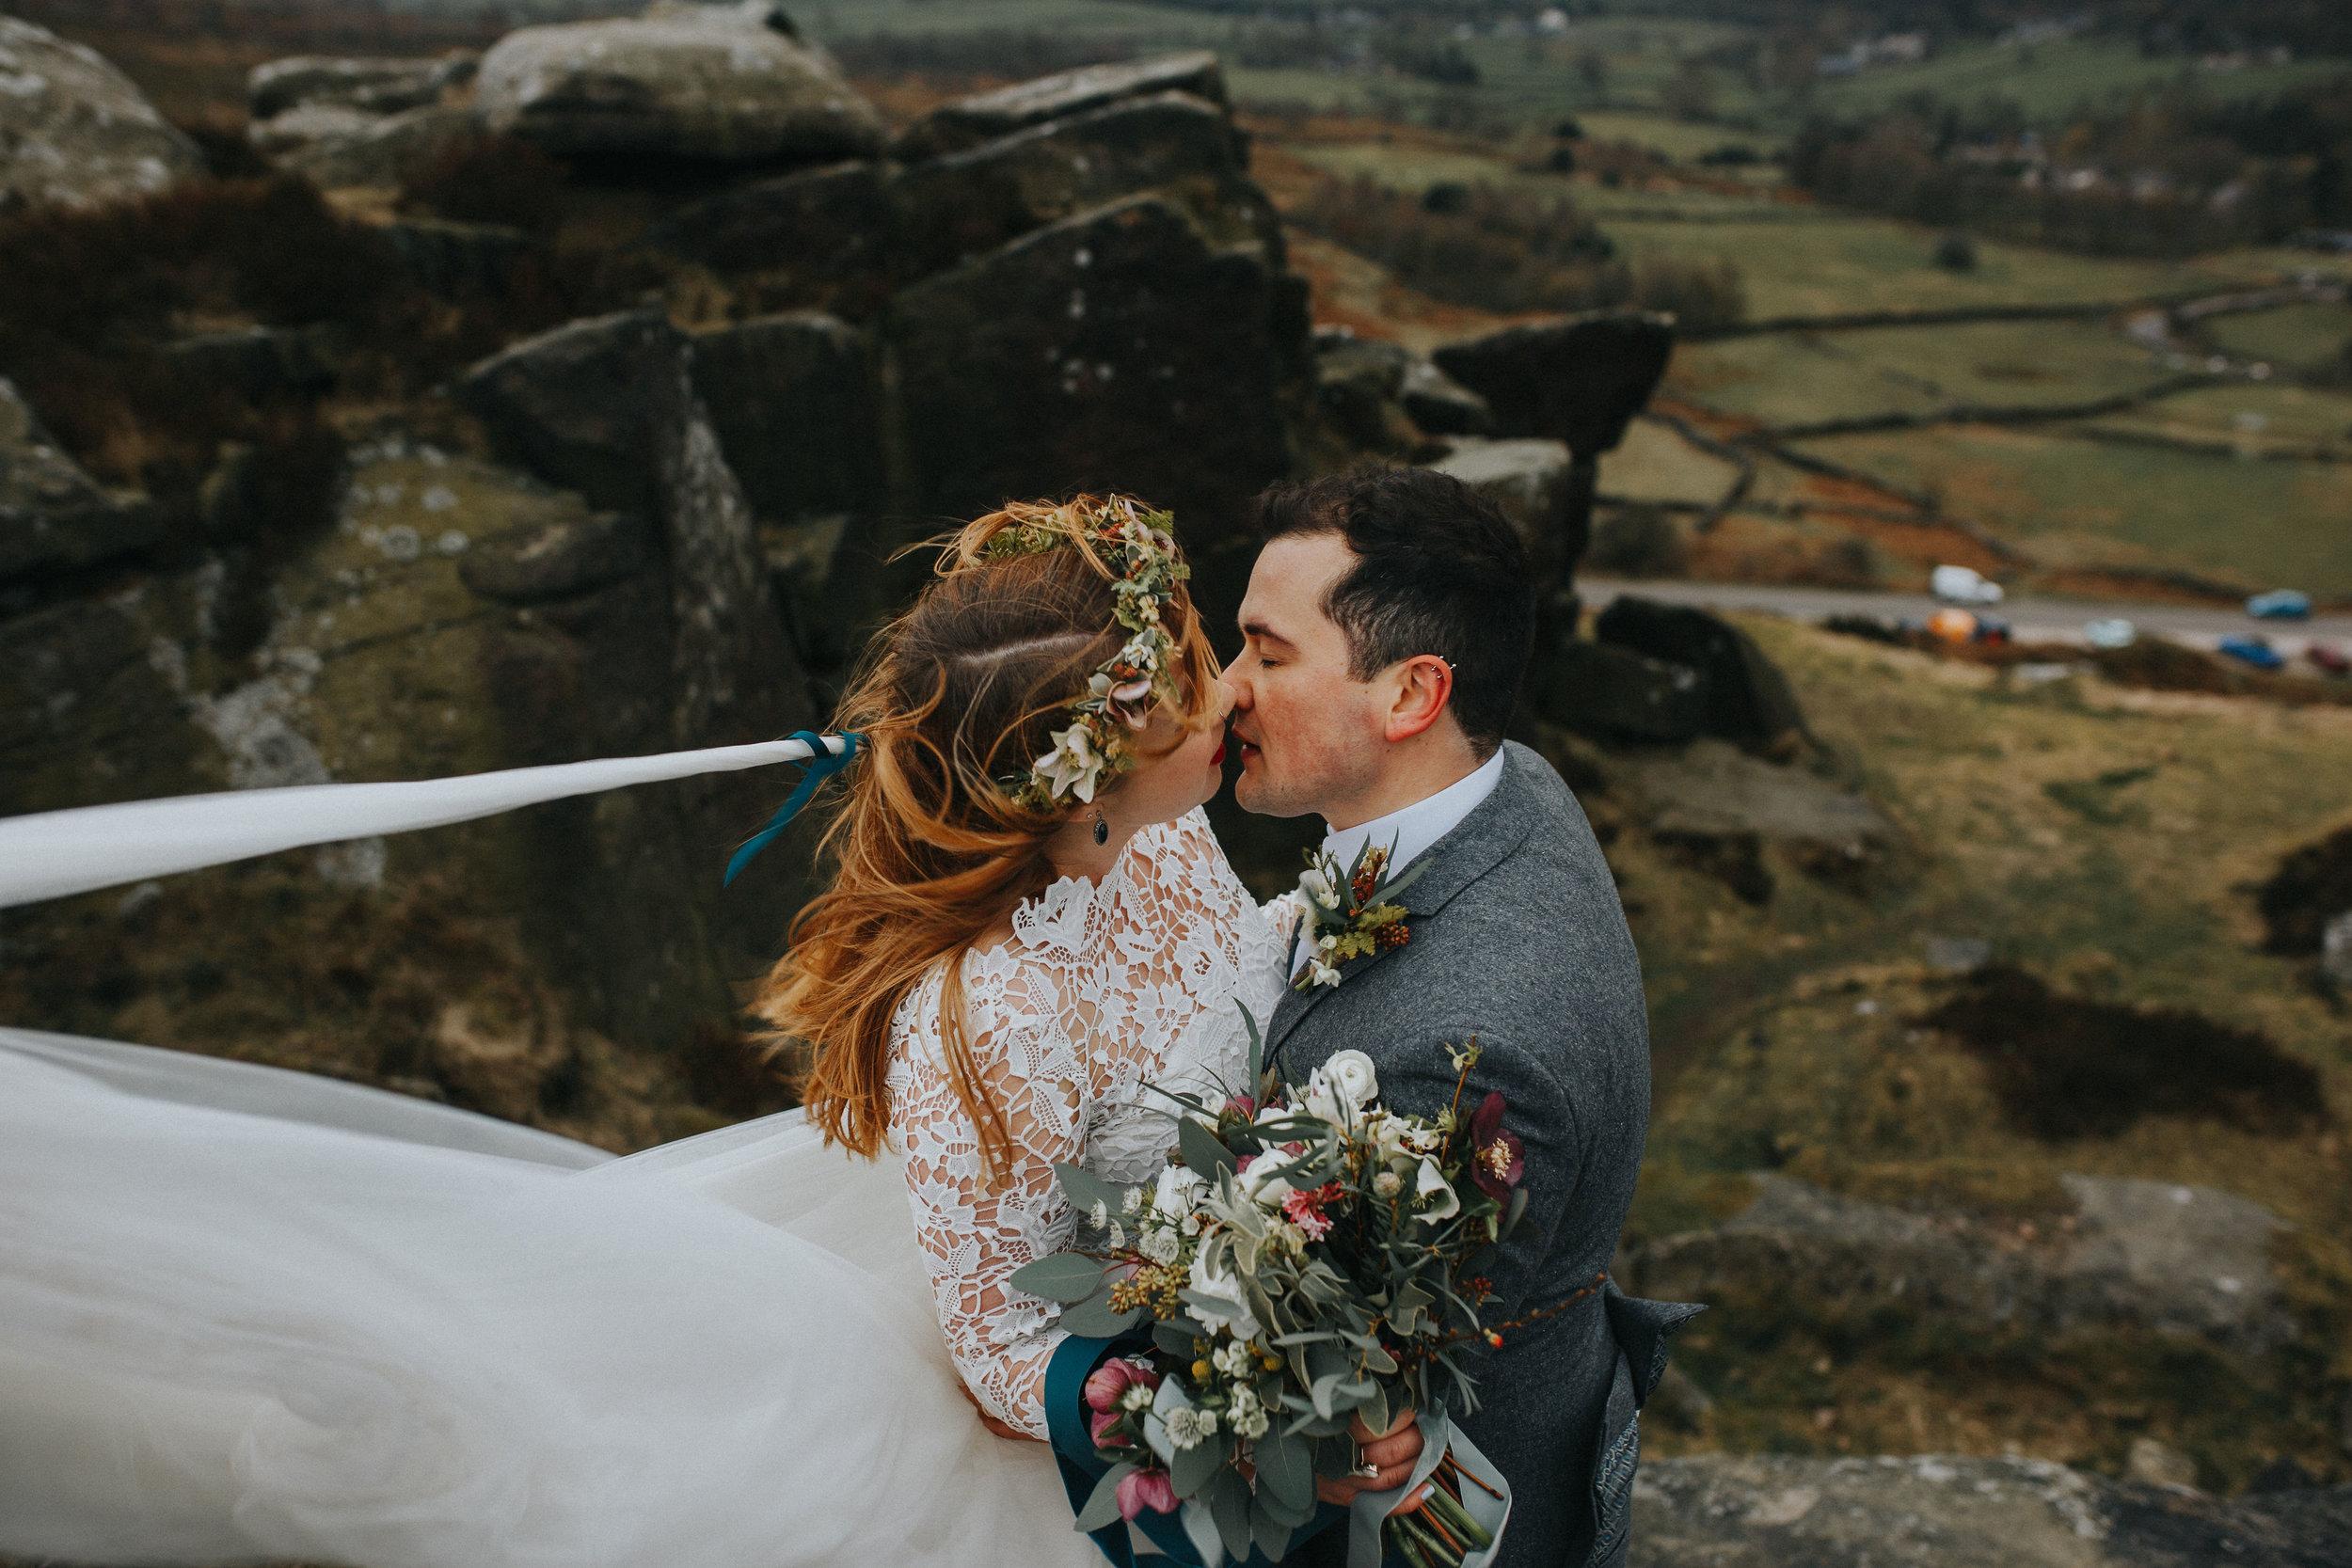 Rosie-bespoke-lace-long sleeved-tulle-wedding-dress-winter-peak district-susanna greening-26.jpg